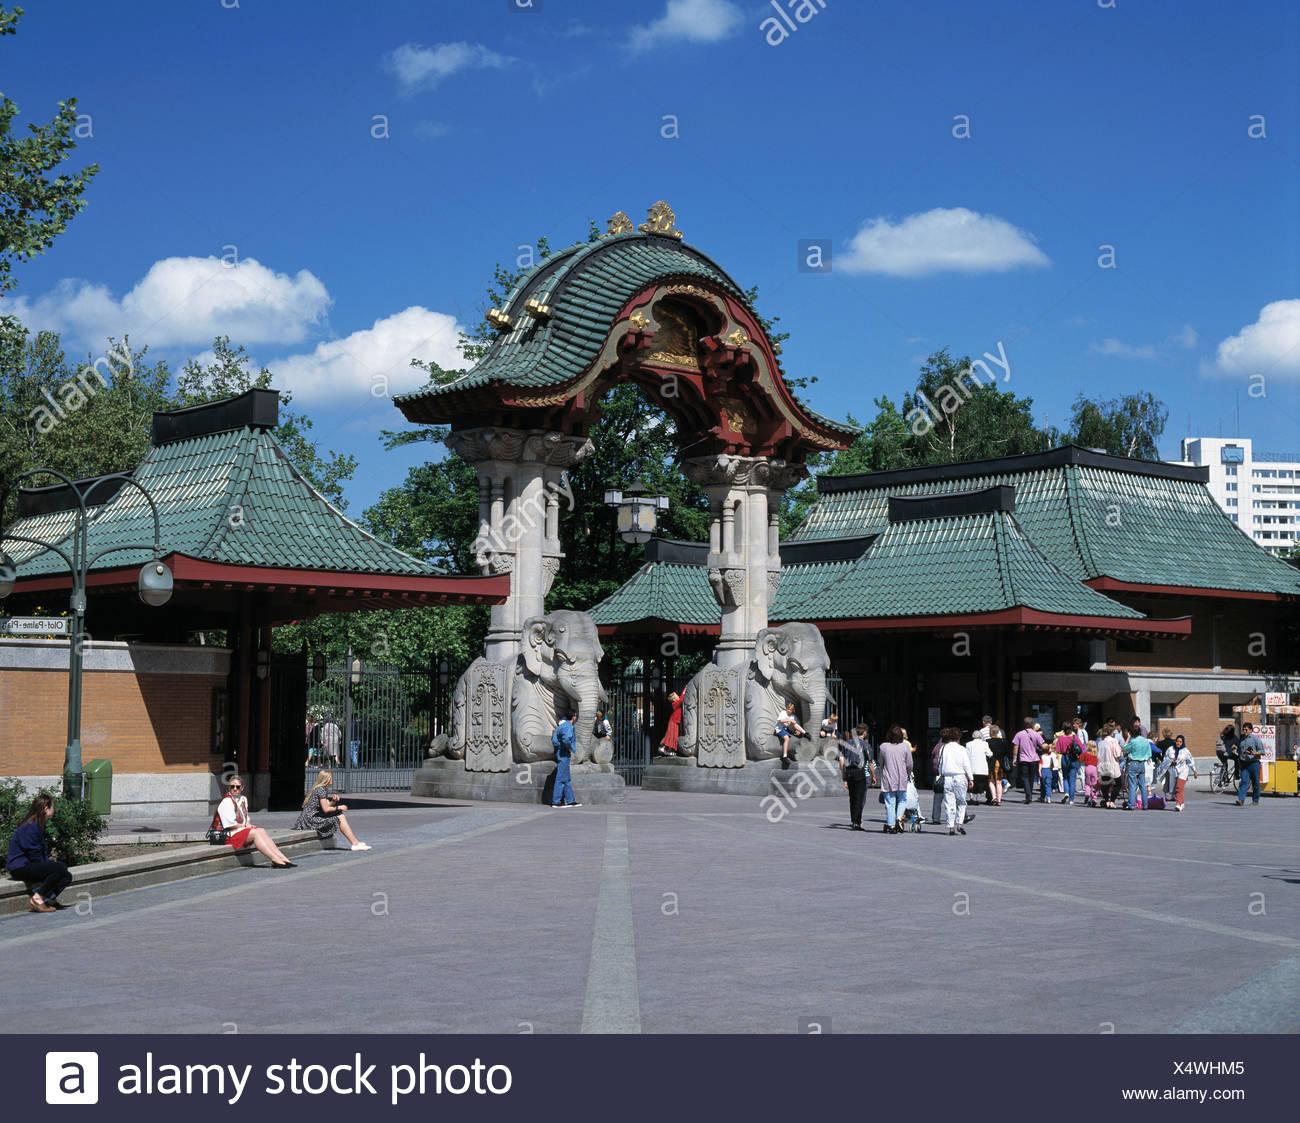 Touristen Eintritt Zoo Berlin Tiergarten Tierpark Zoo Elefant